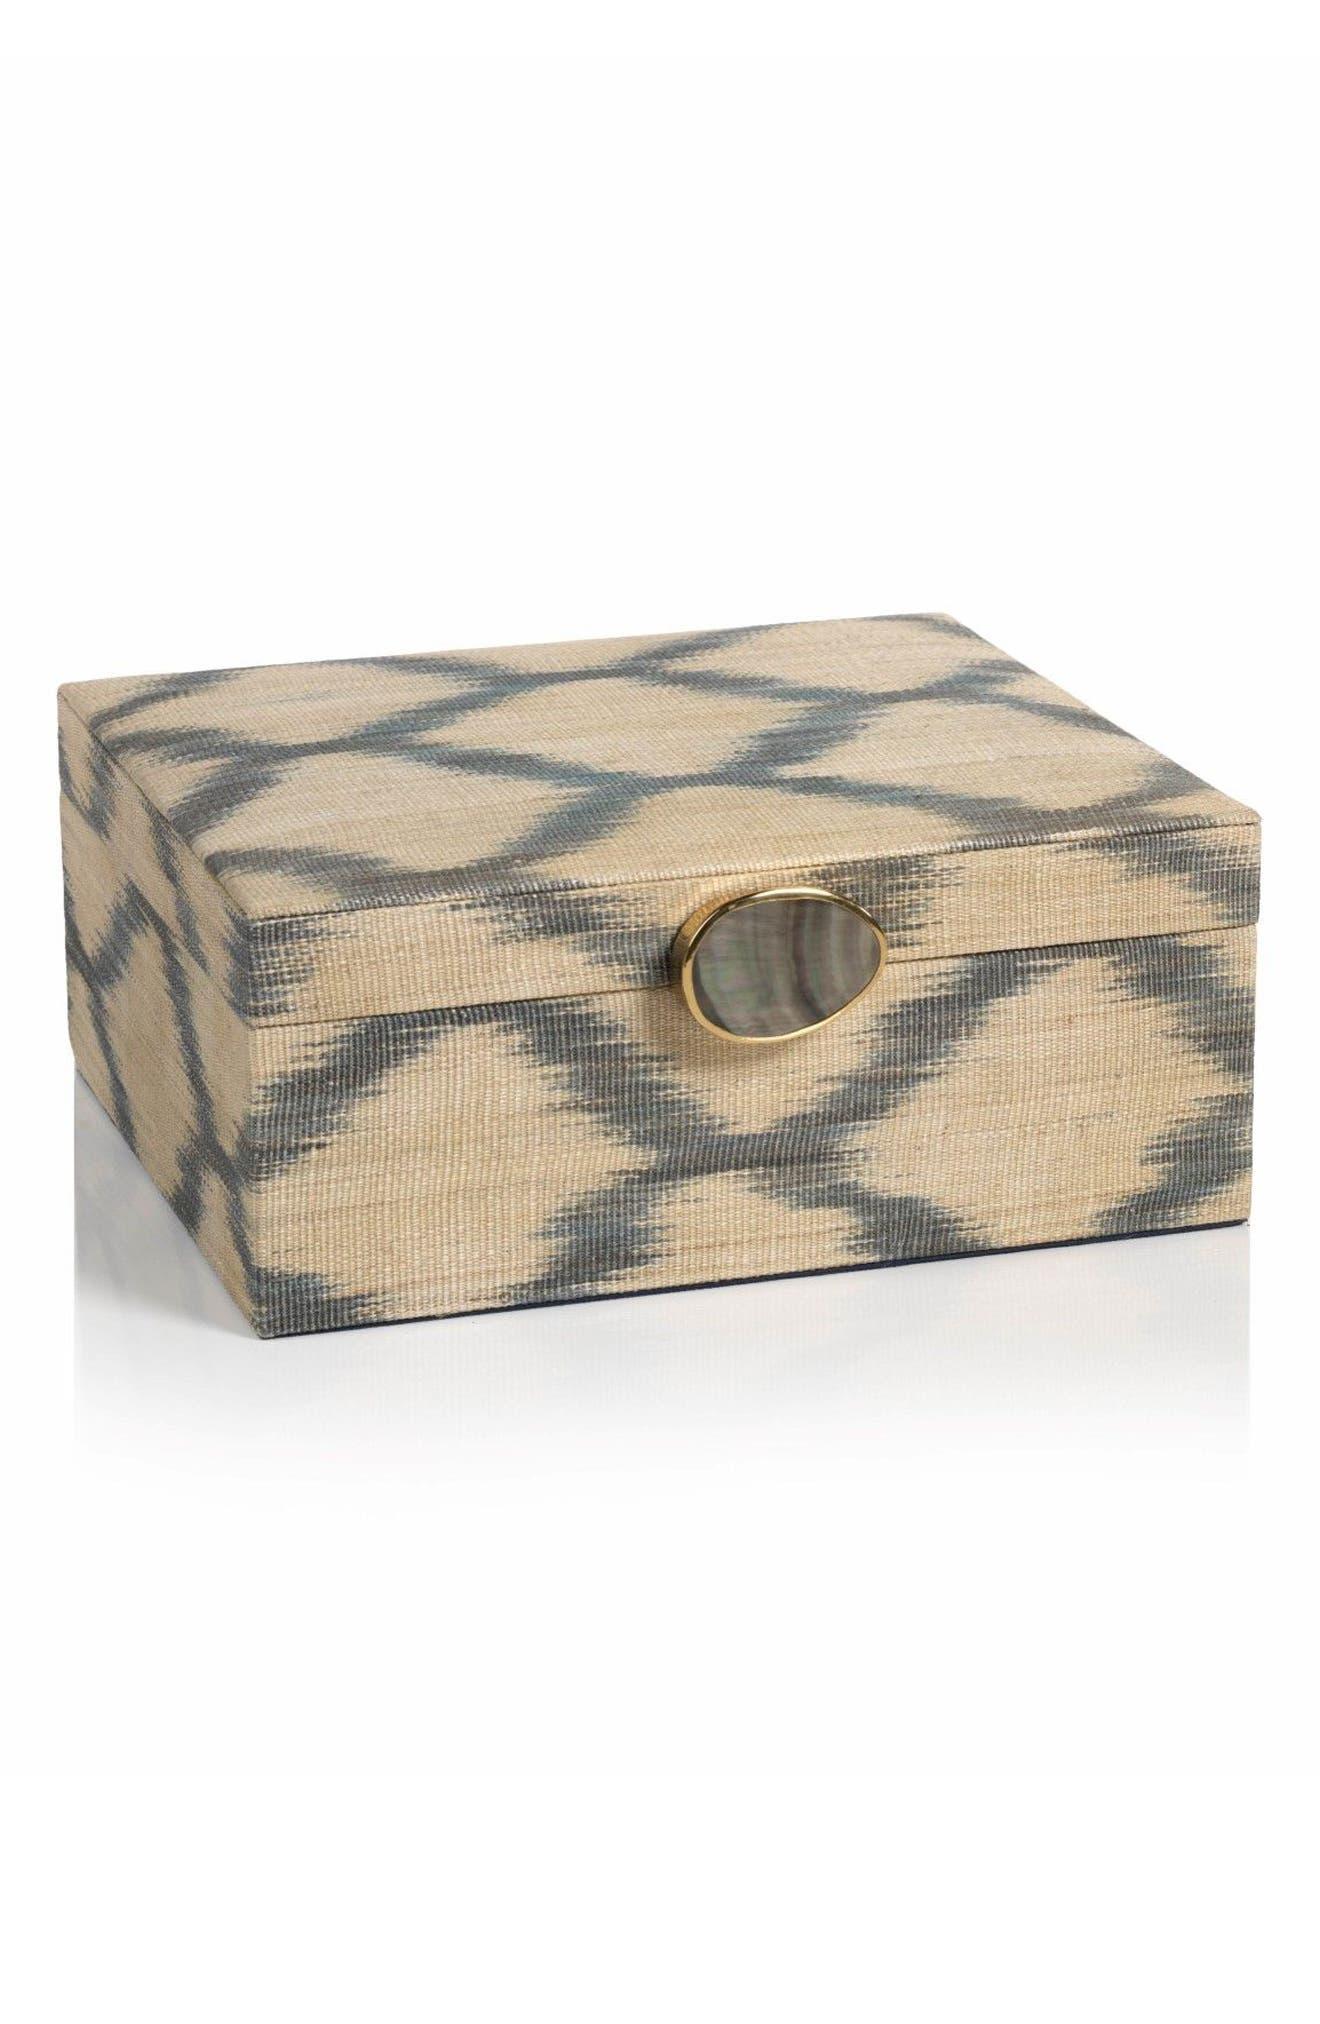 Large Ikat Storage Box,                         Main,                         color, Beige/ Gray